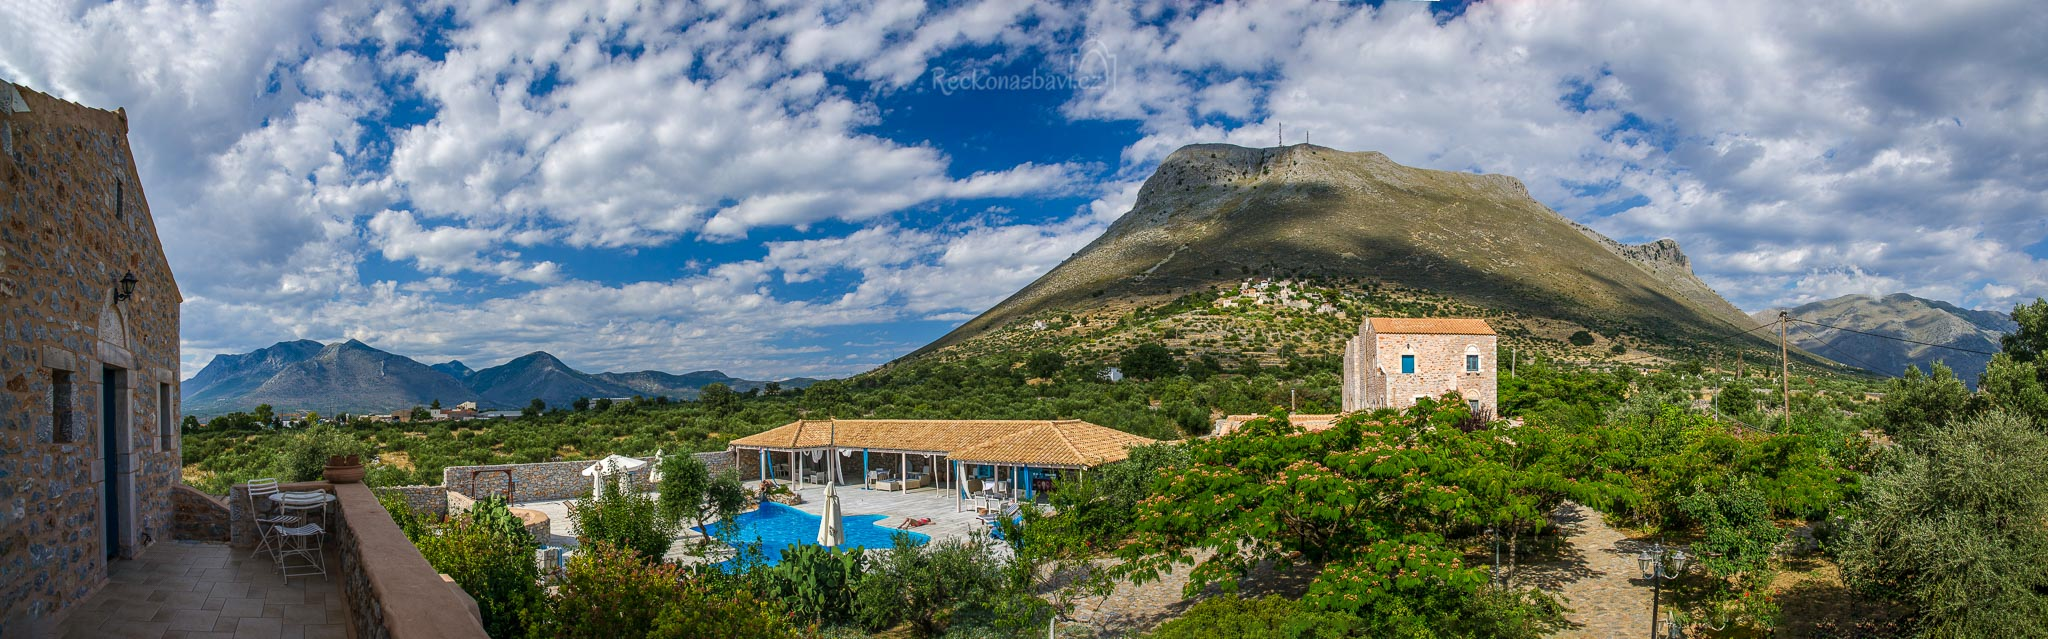 až panoramatický výhled z našeho pokoje: hory, bazén, rozkvetlá zahrada, všechno na dosah ruky...